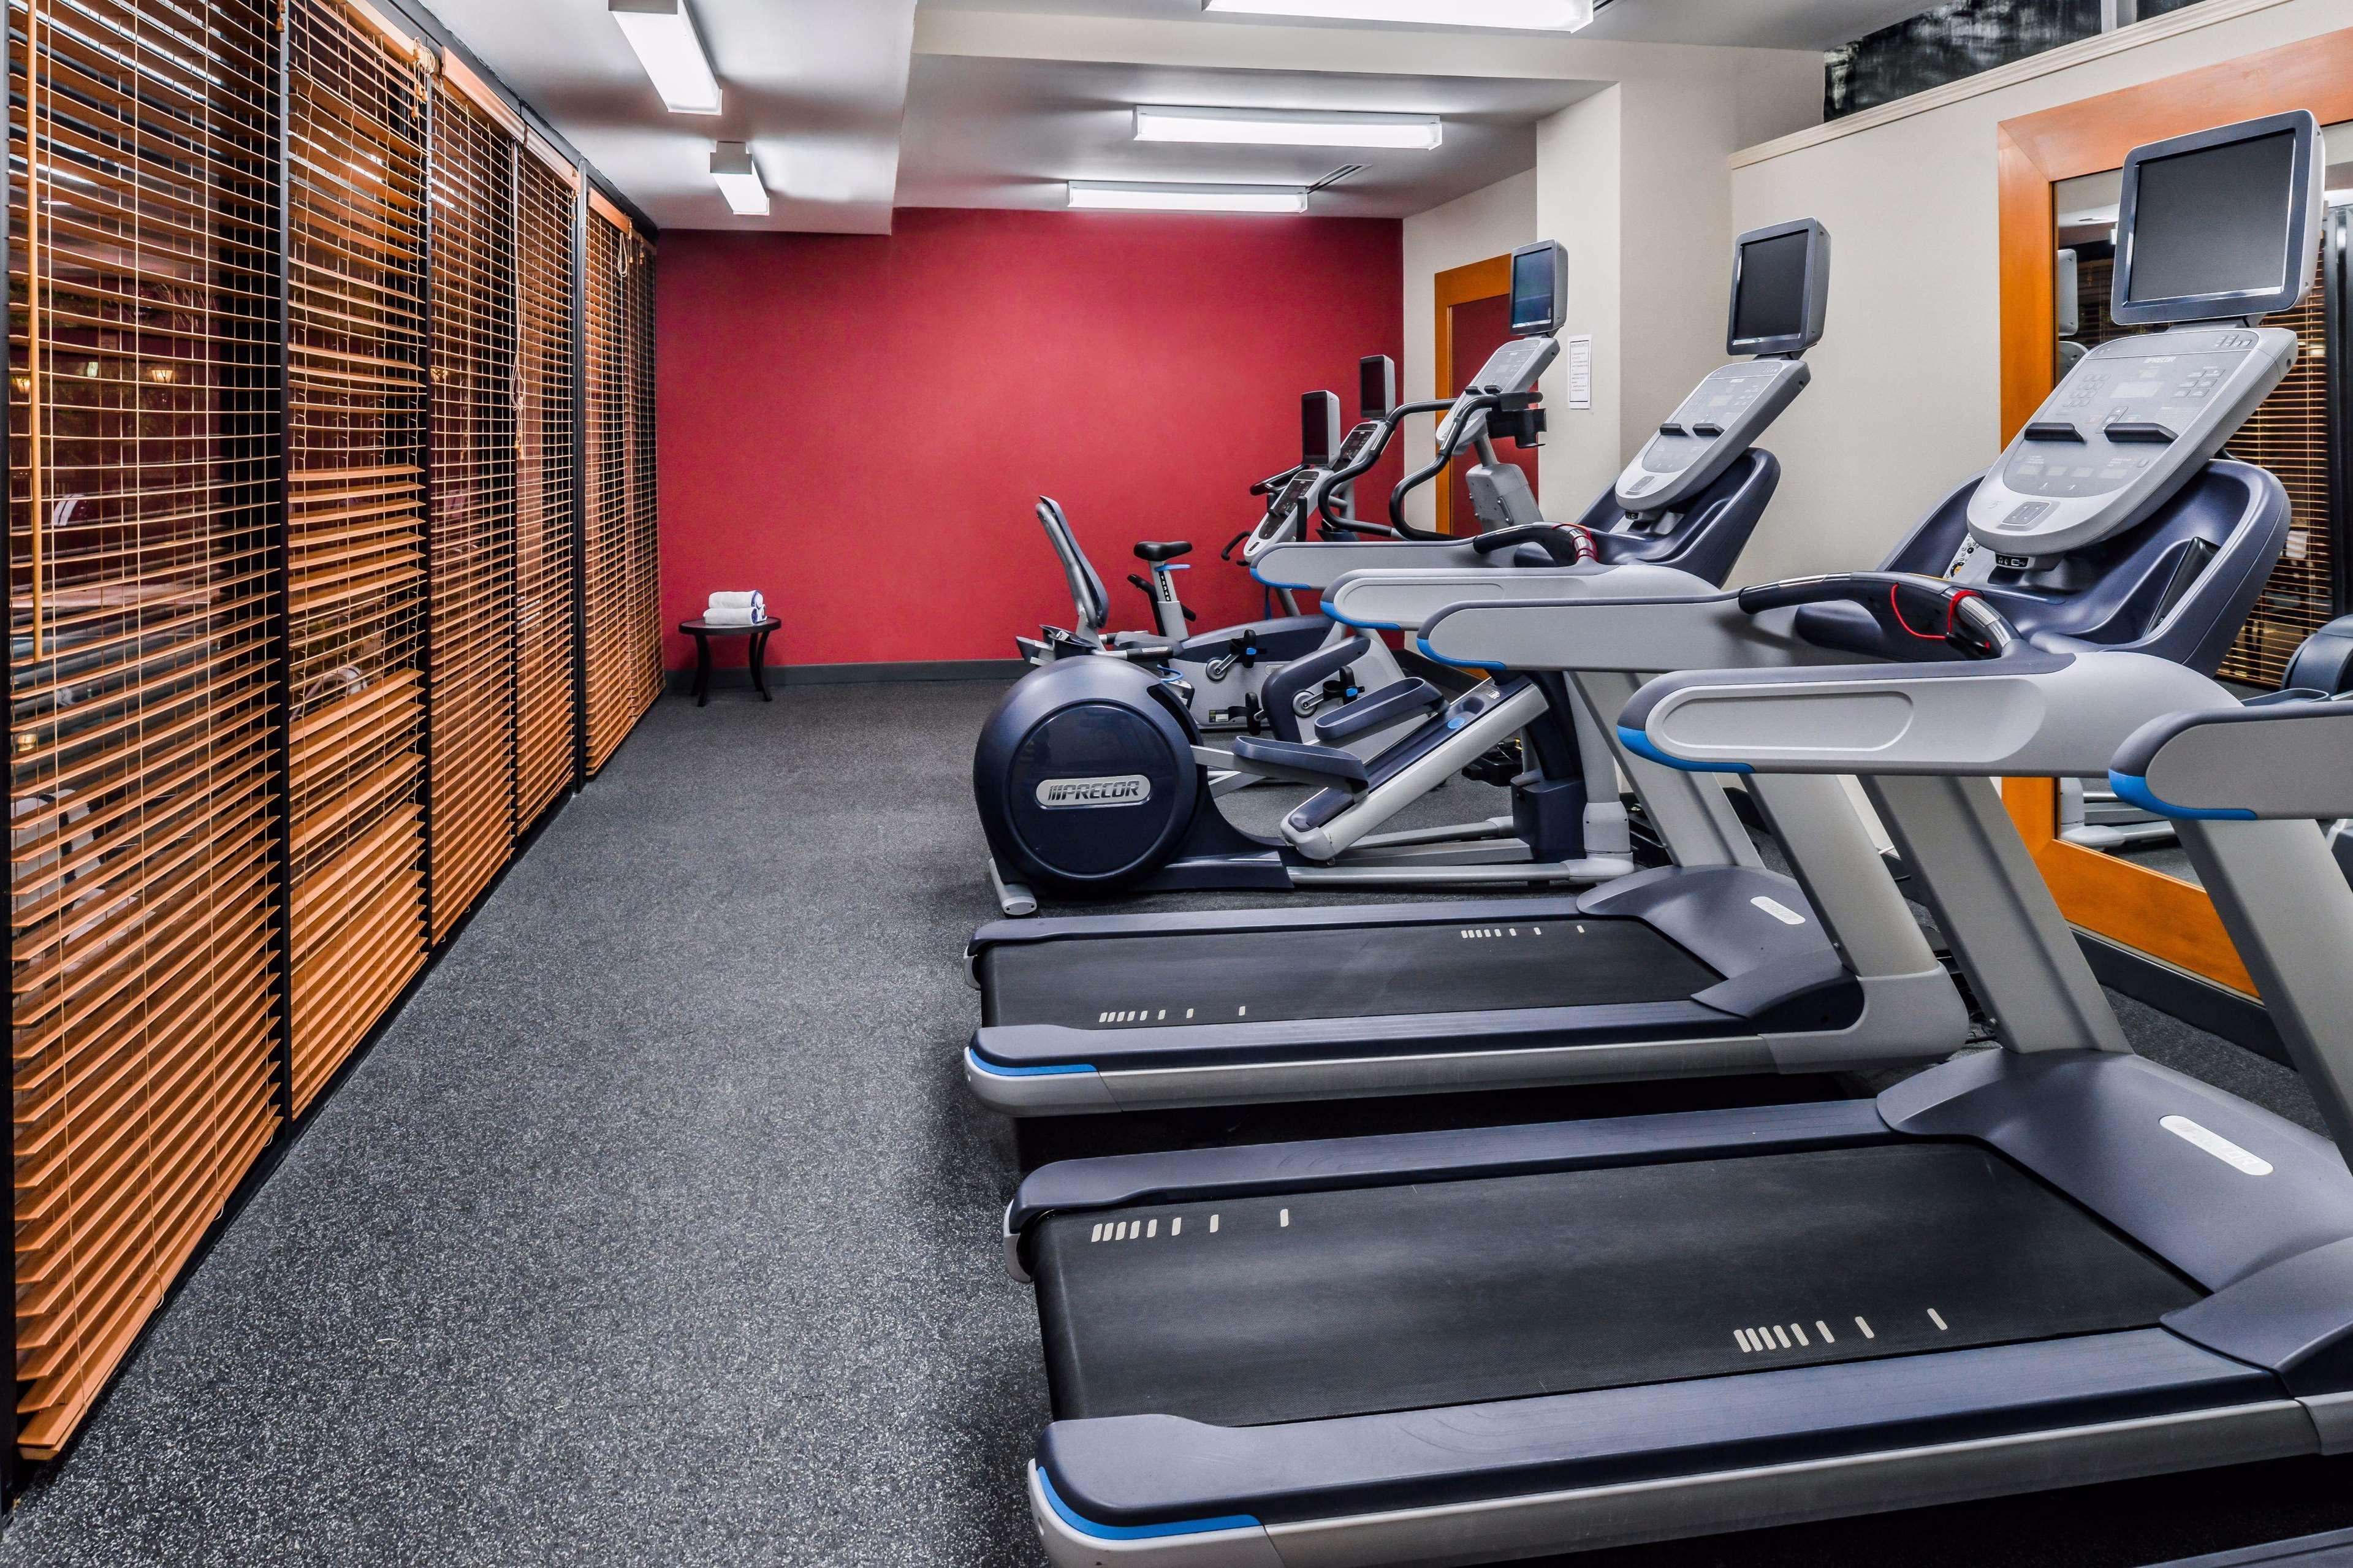 Tamaroff Honda Service Center >> Hilton Garden Inn Detroit-Southfield, MI., Southfield Michigan (MI) - LocalDatabase.com